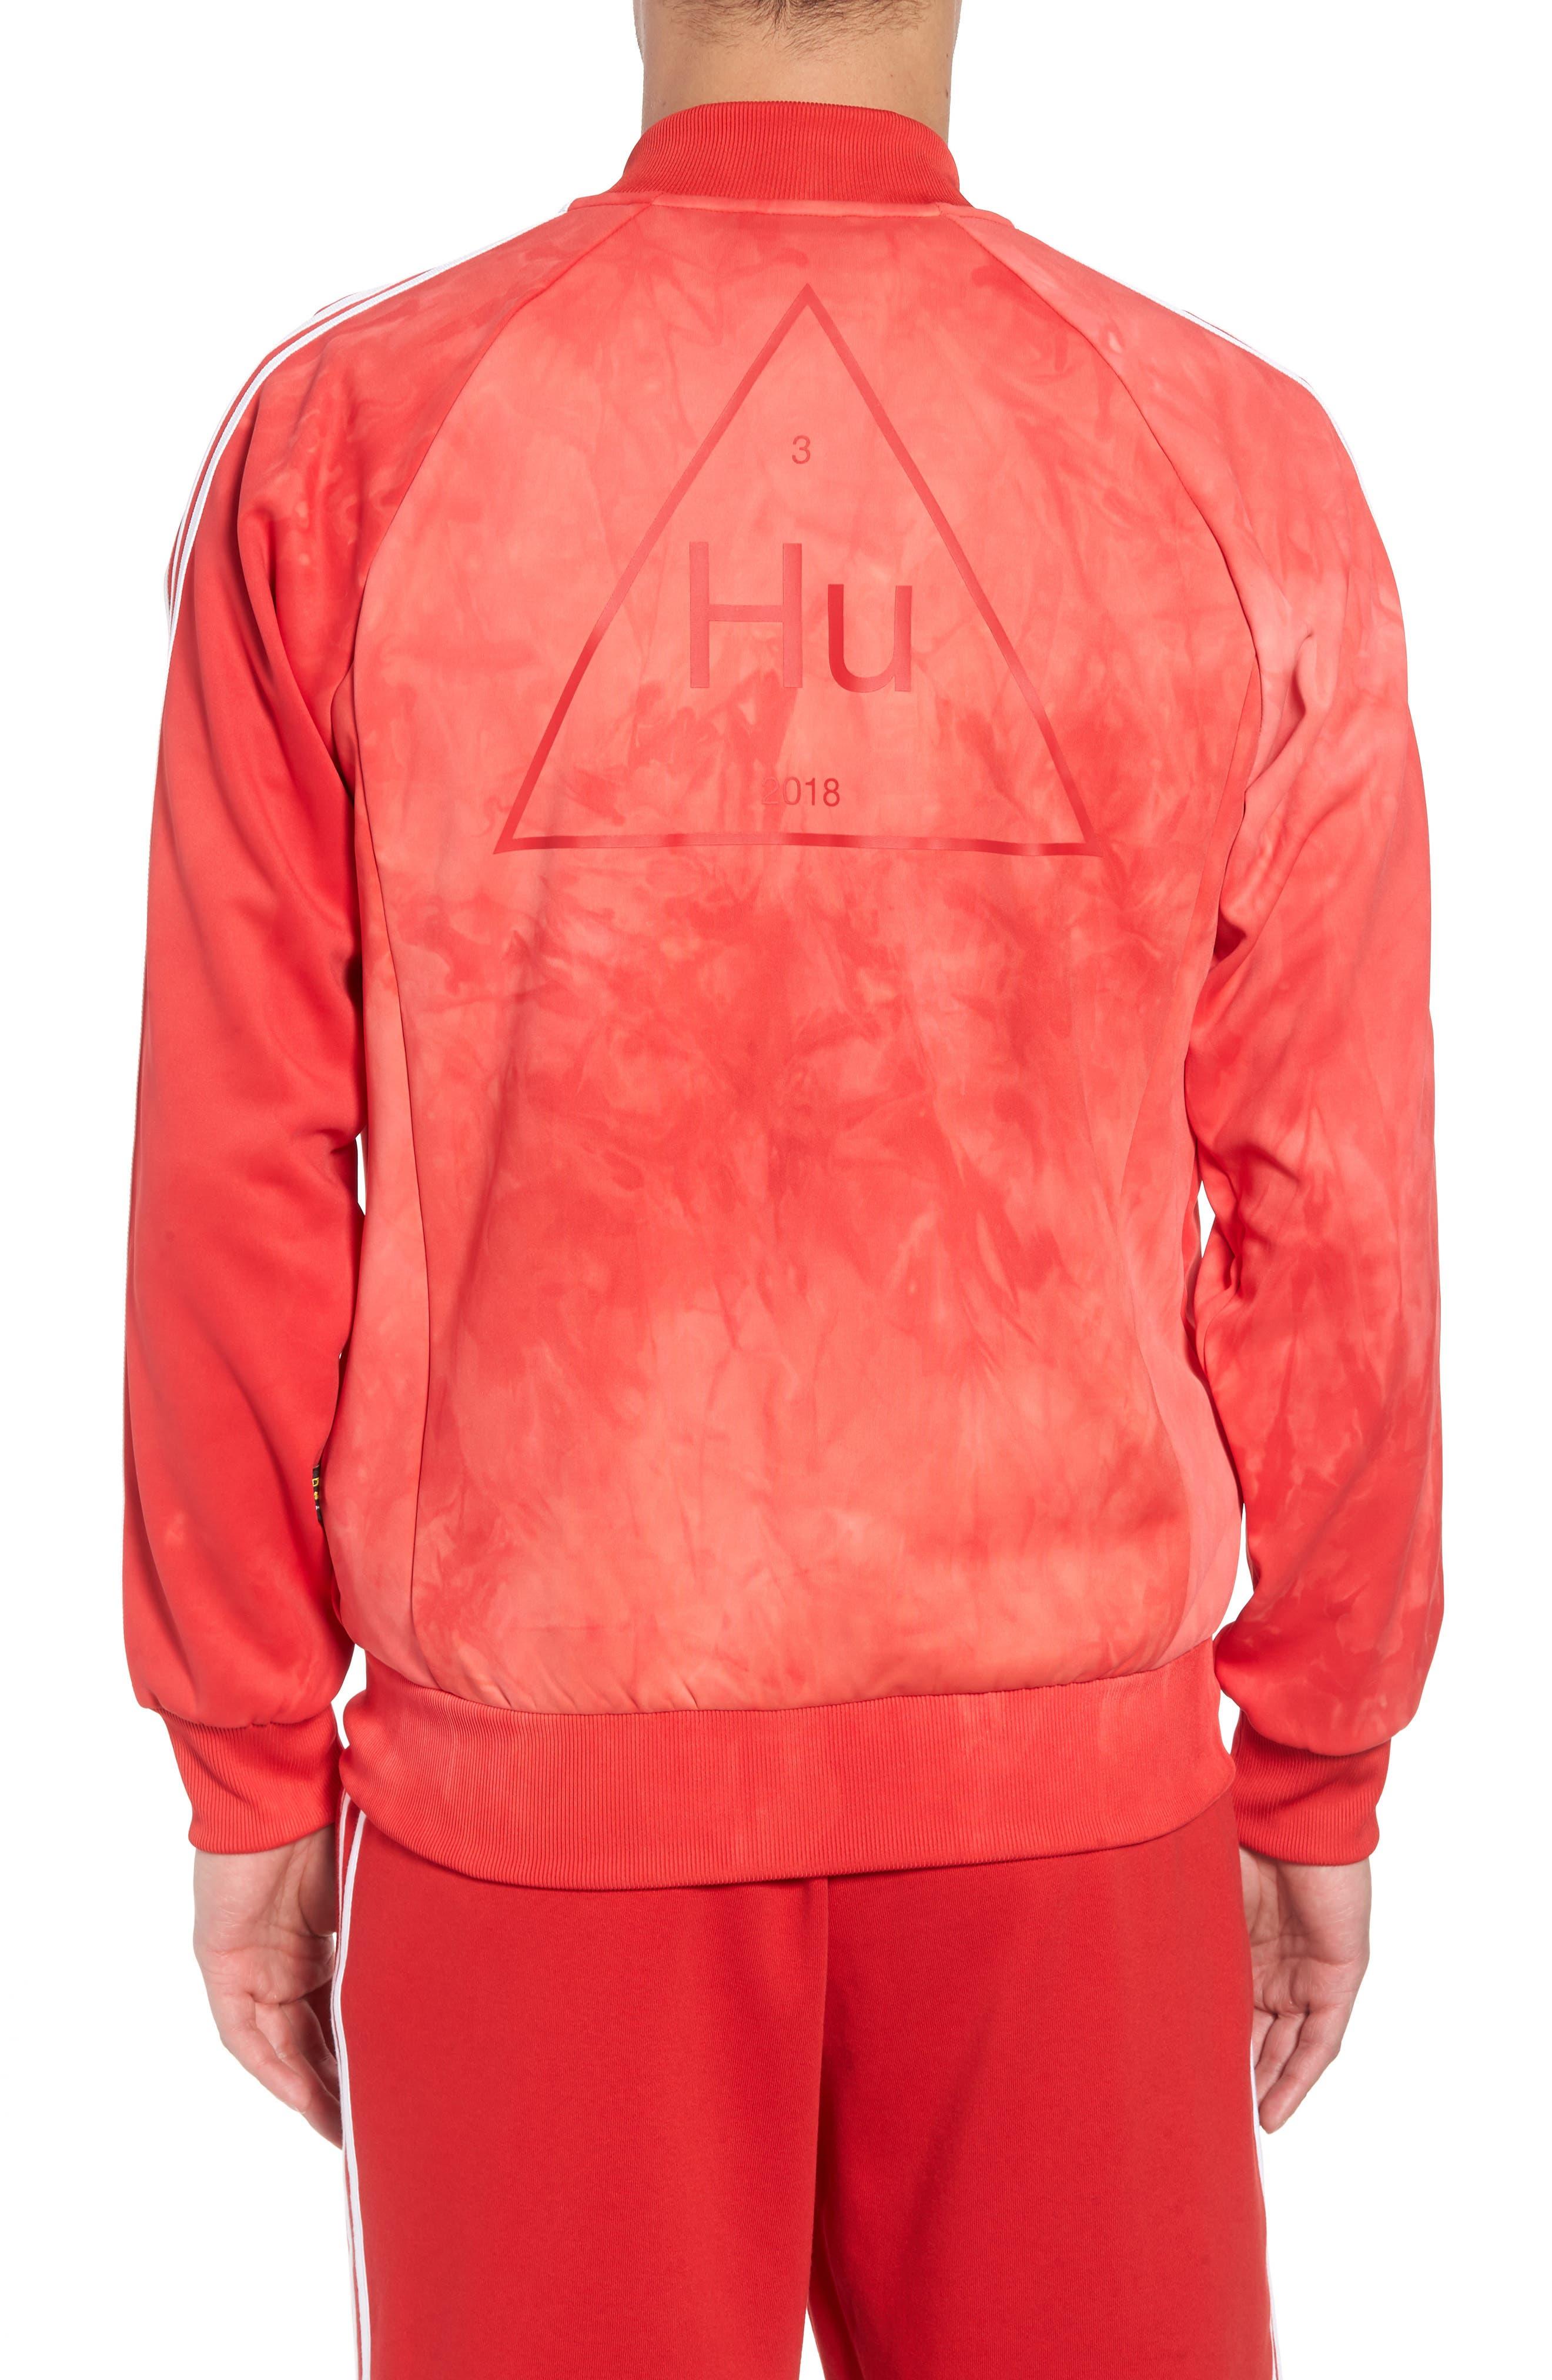 Hu Holi Track Jacket,                             Alternate thumbnail 2, color,                             610